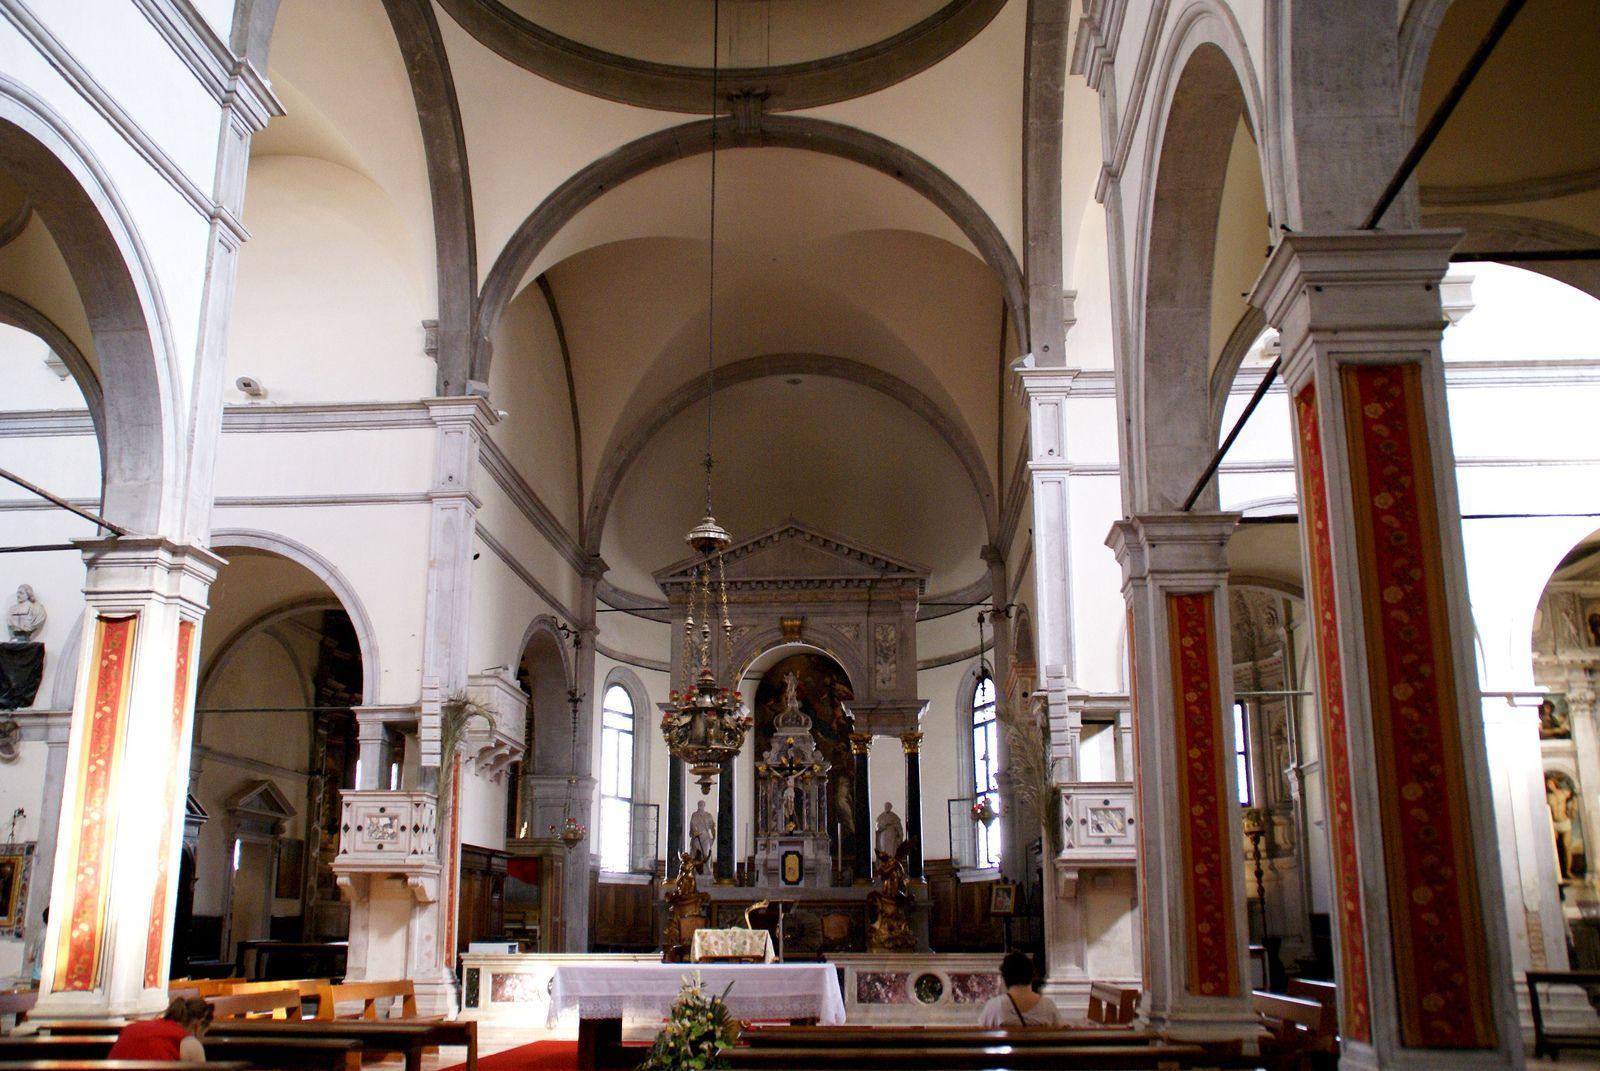 Venedig, Campo Santa Maria Formosa, Chiesa di Santa Maria Formosa | da HEN-Magonza